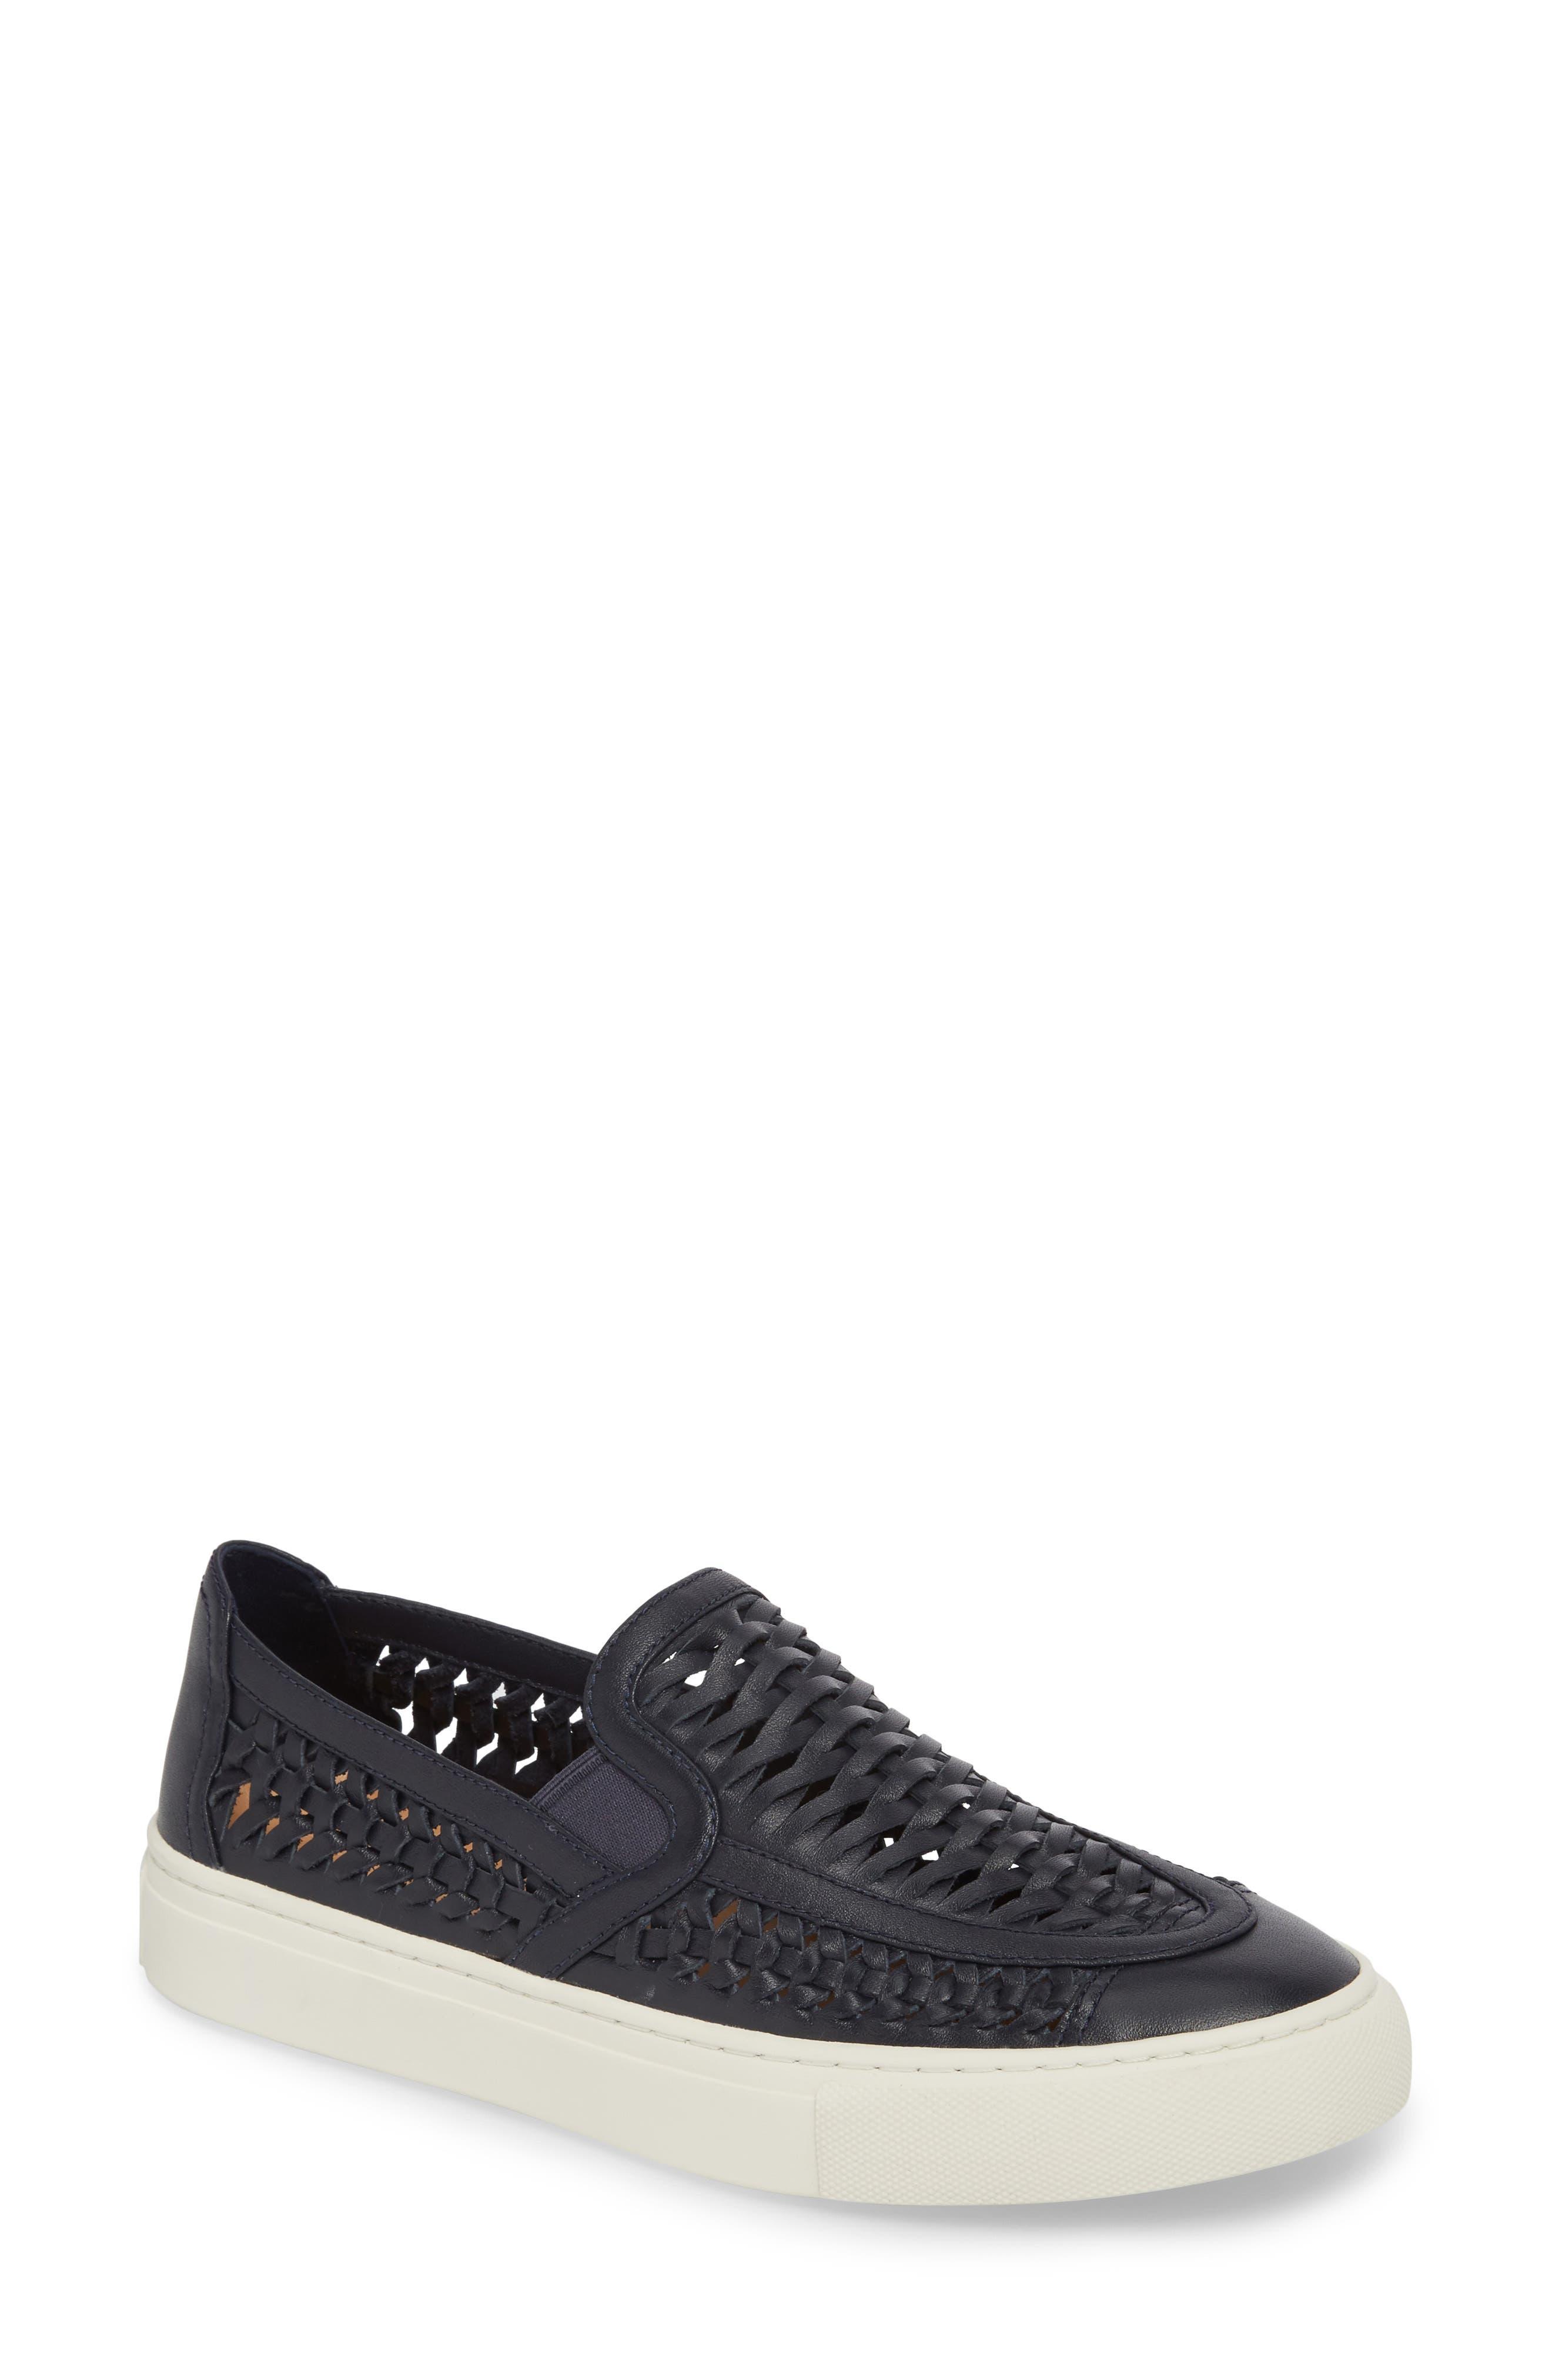 Tory Burch Huarache 2 Slip-On Sneaker